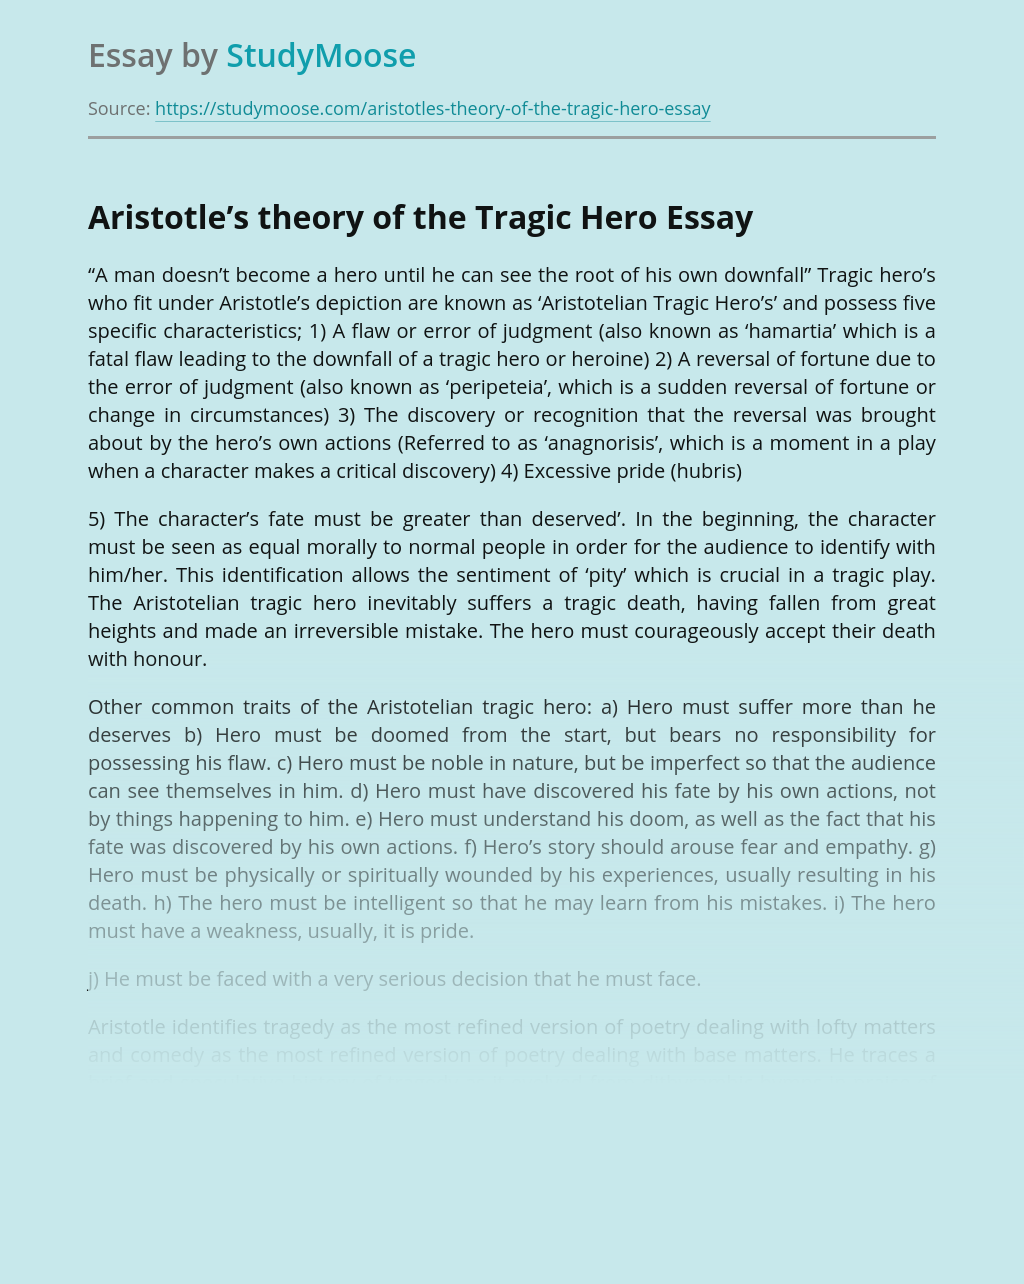 Aristotle's theory of the Tragic Hero